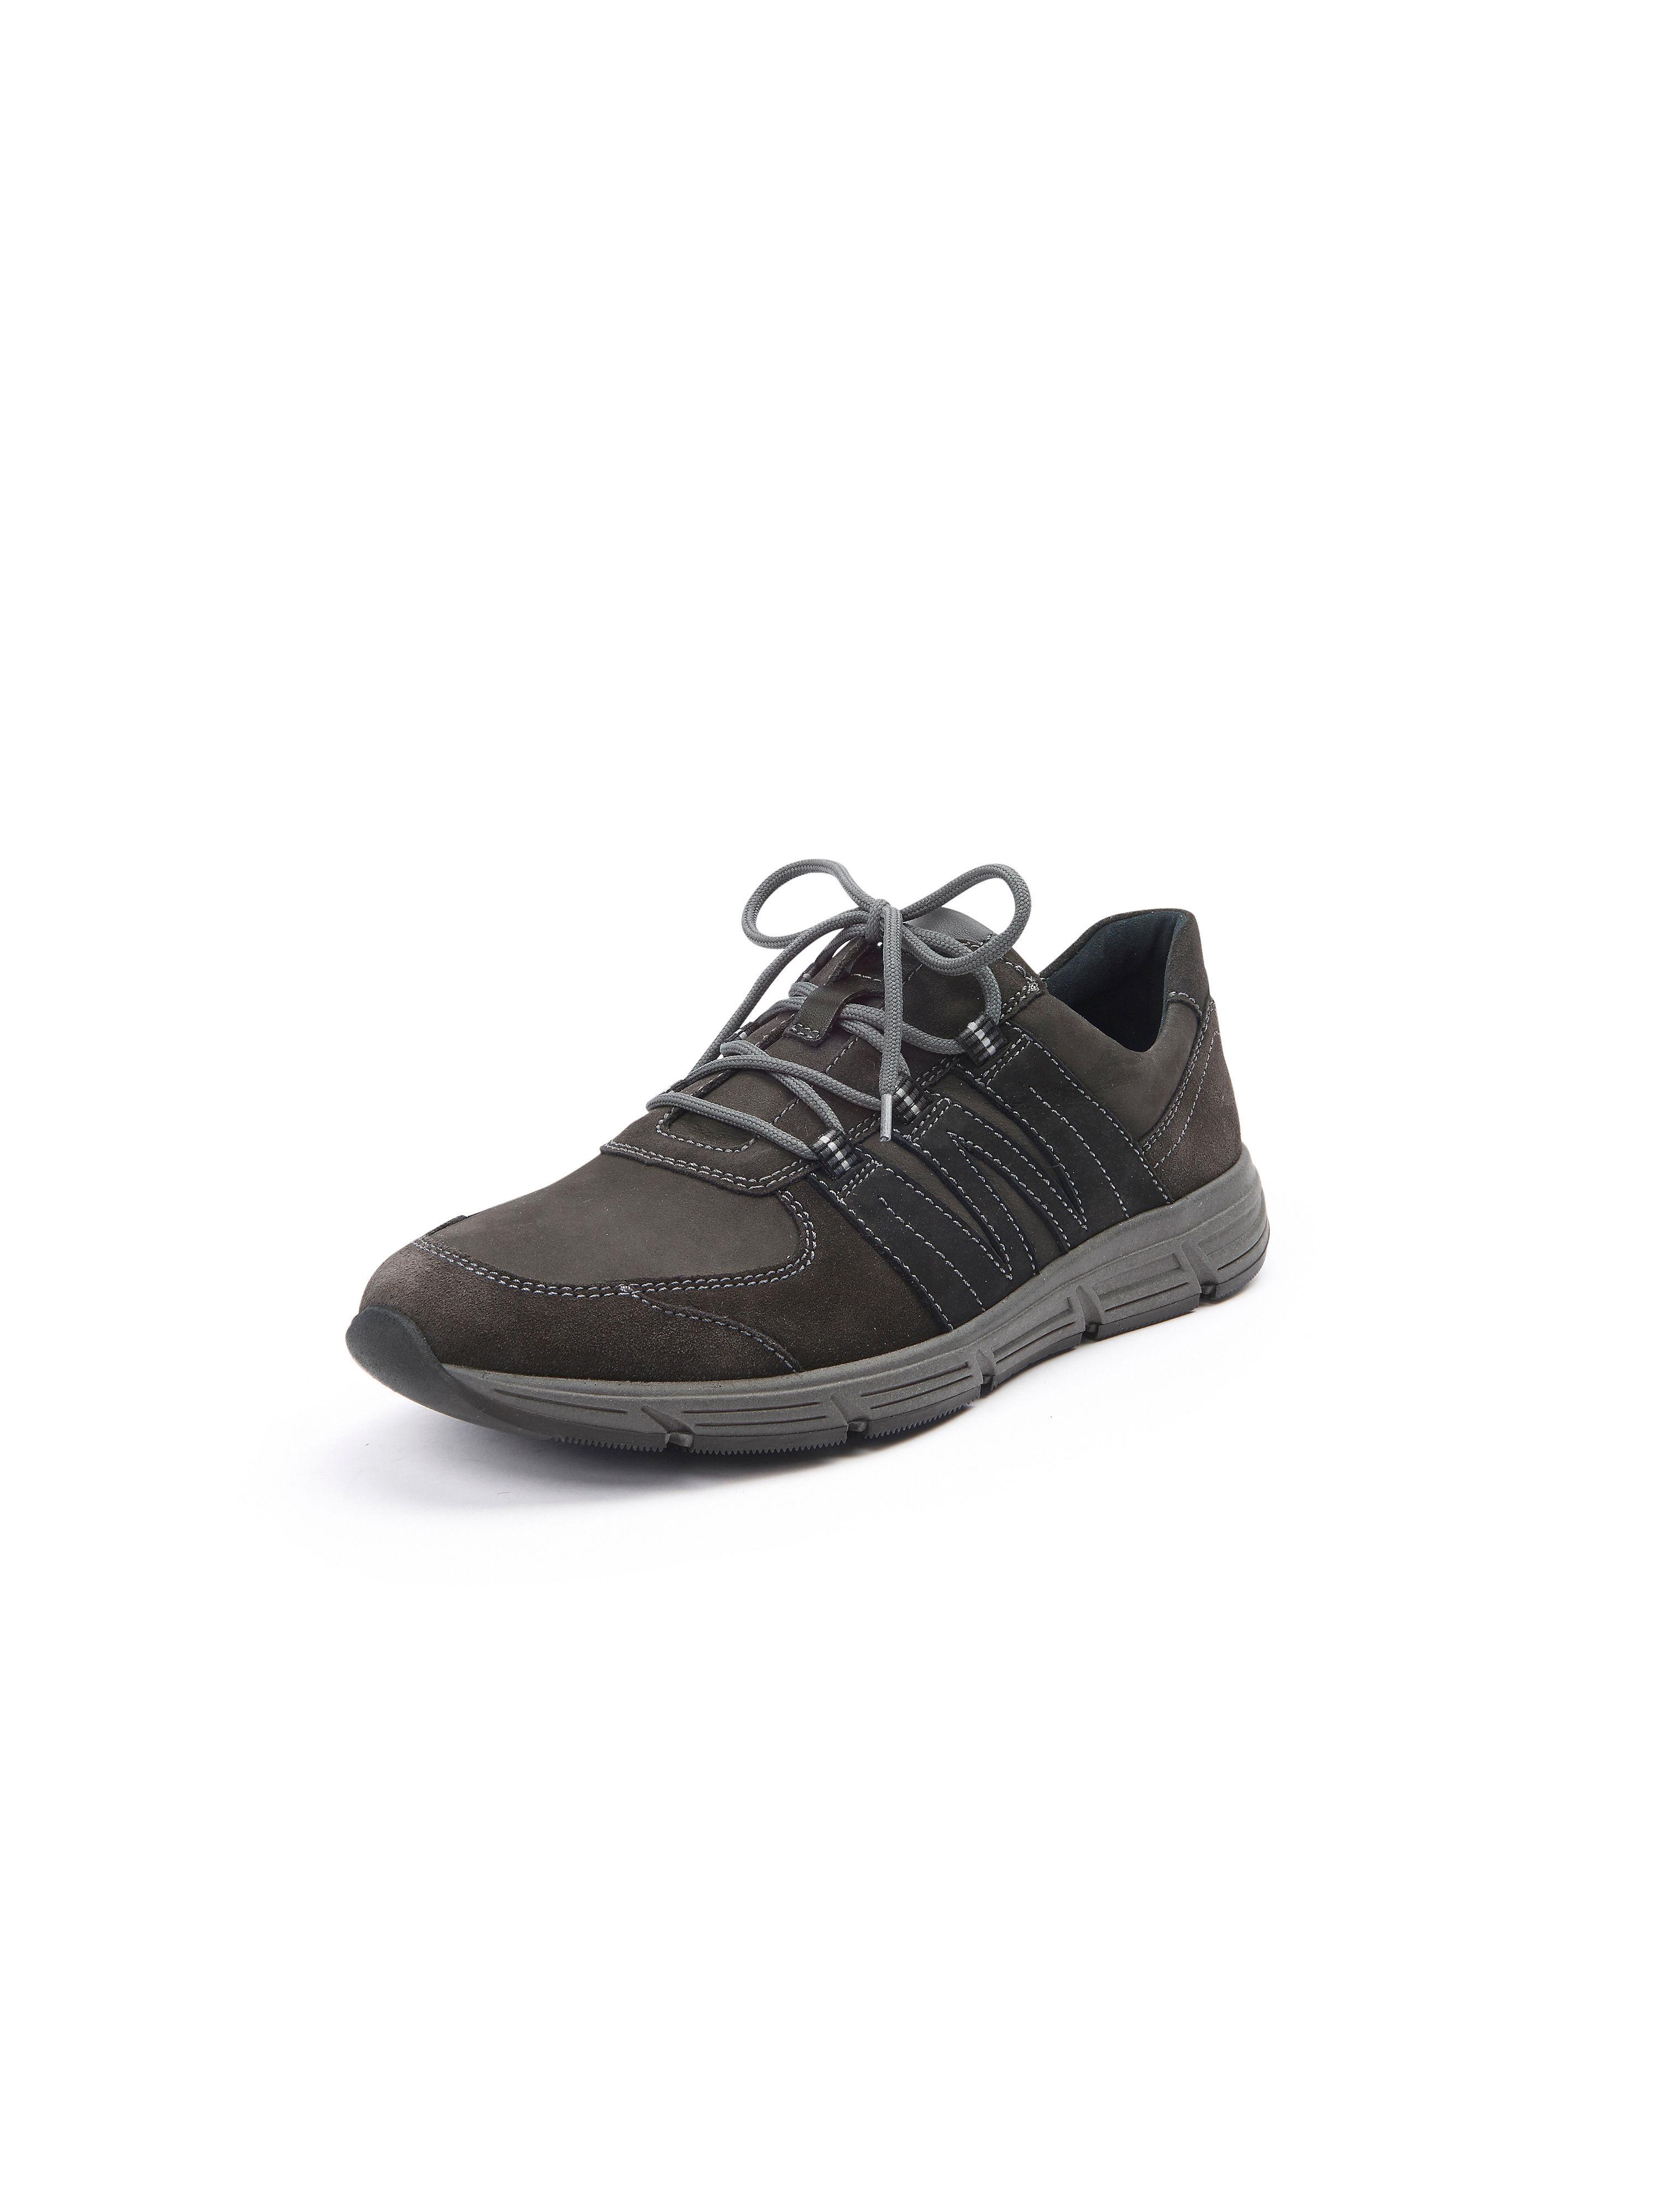 Image of   Sneakers Haslo høj komfort Fra Waldläufer grå